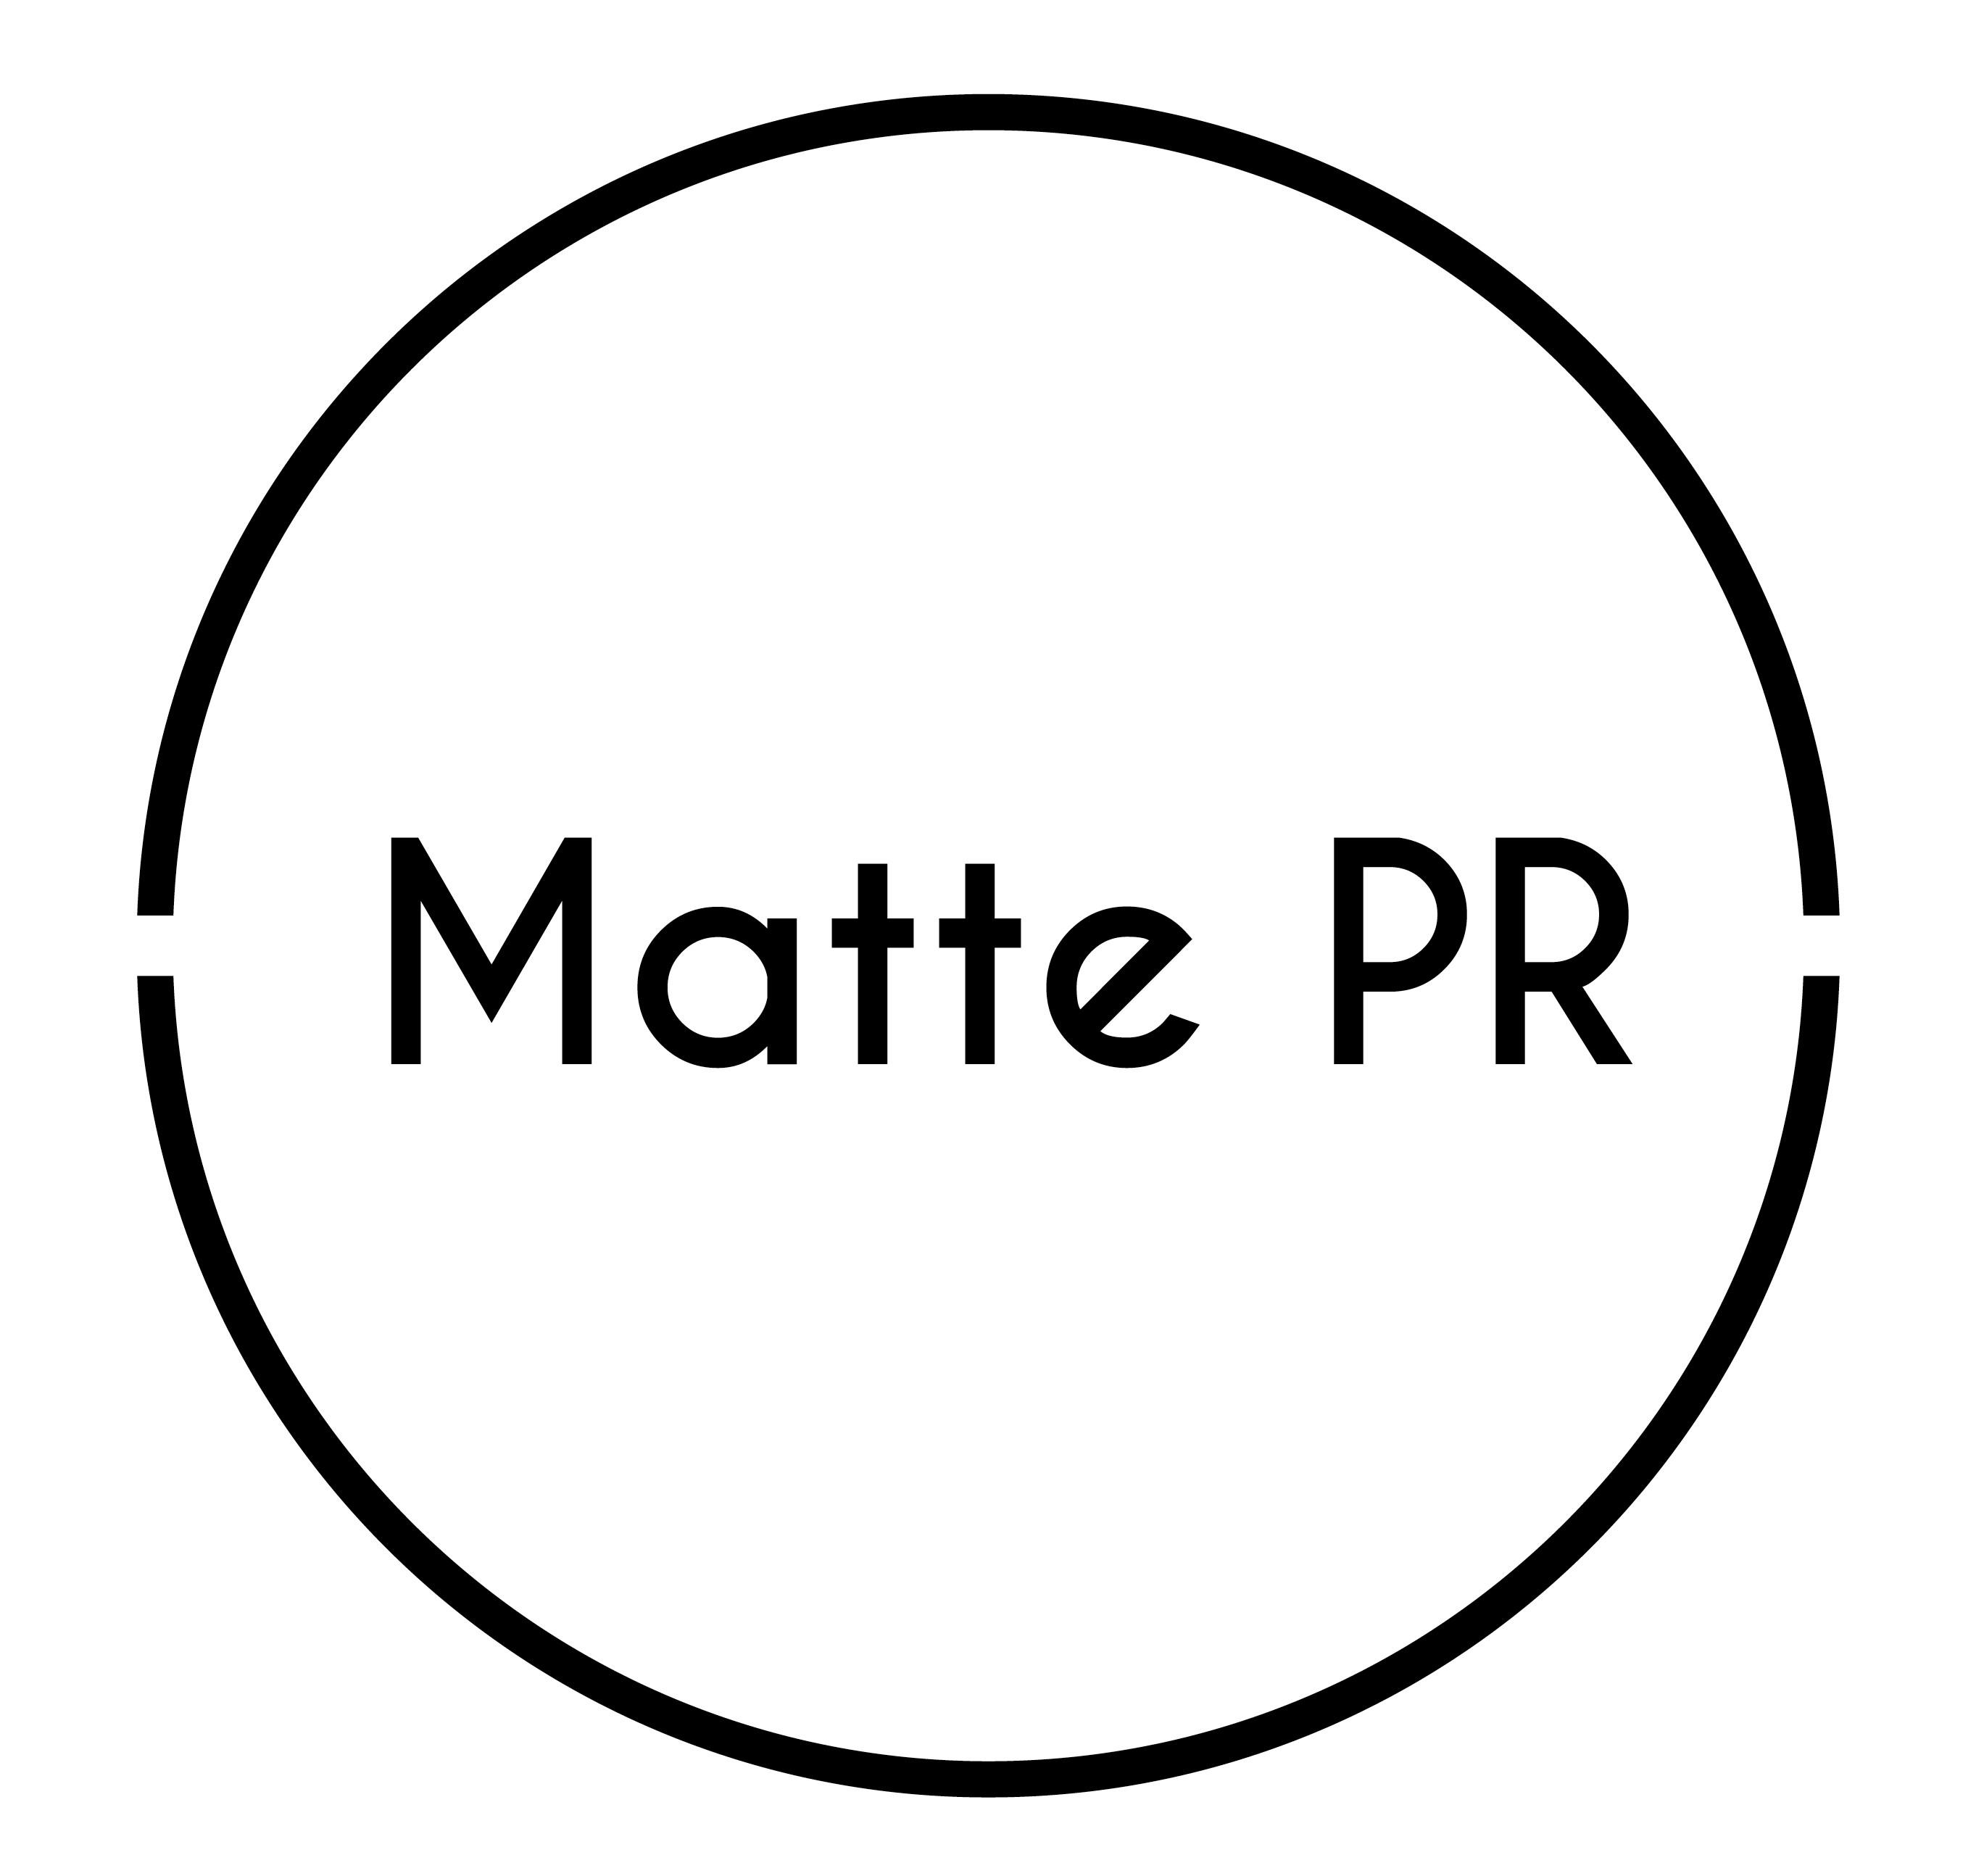 Matte PR Inc